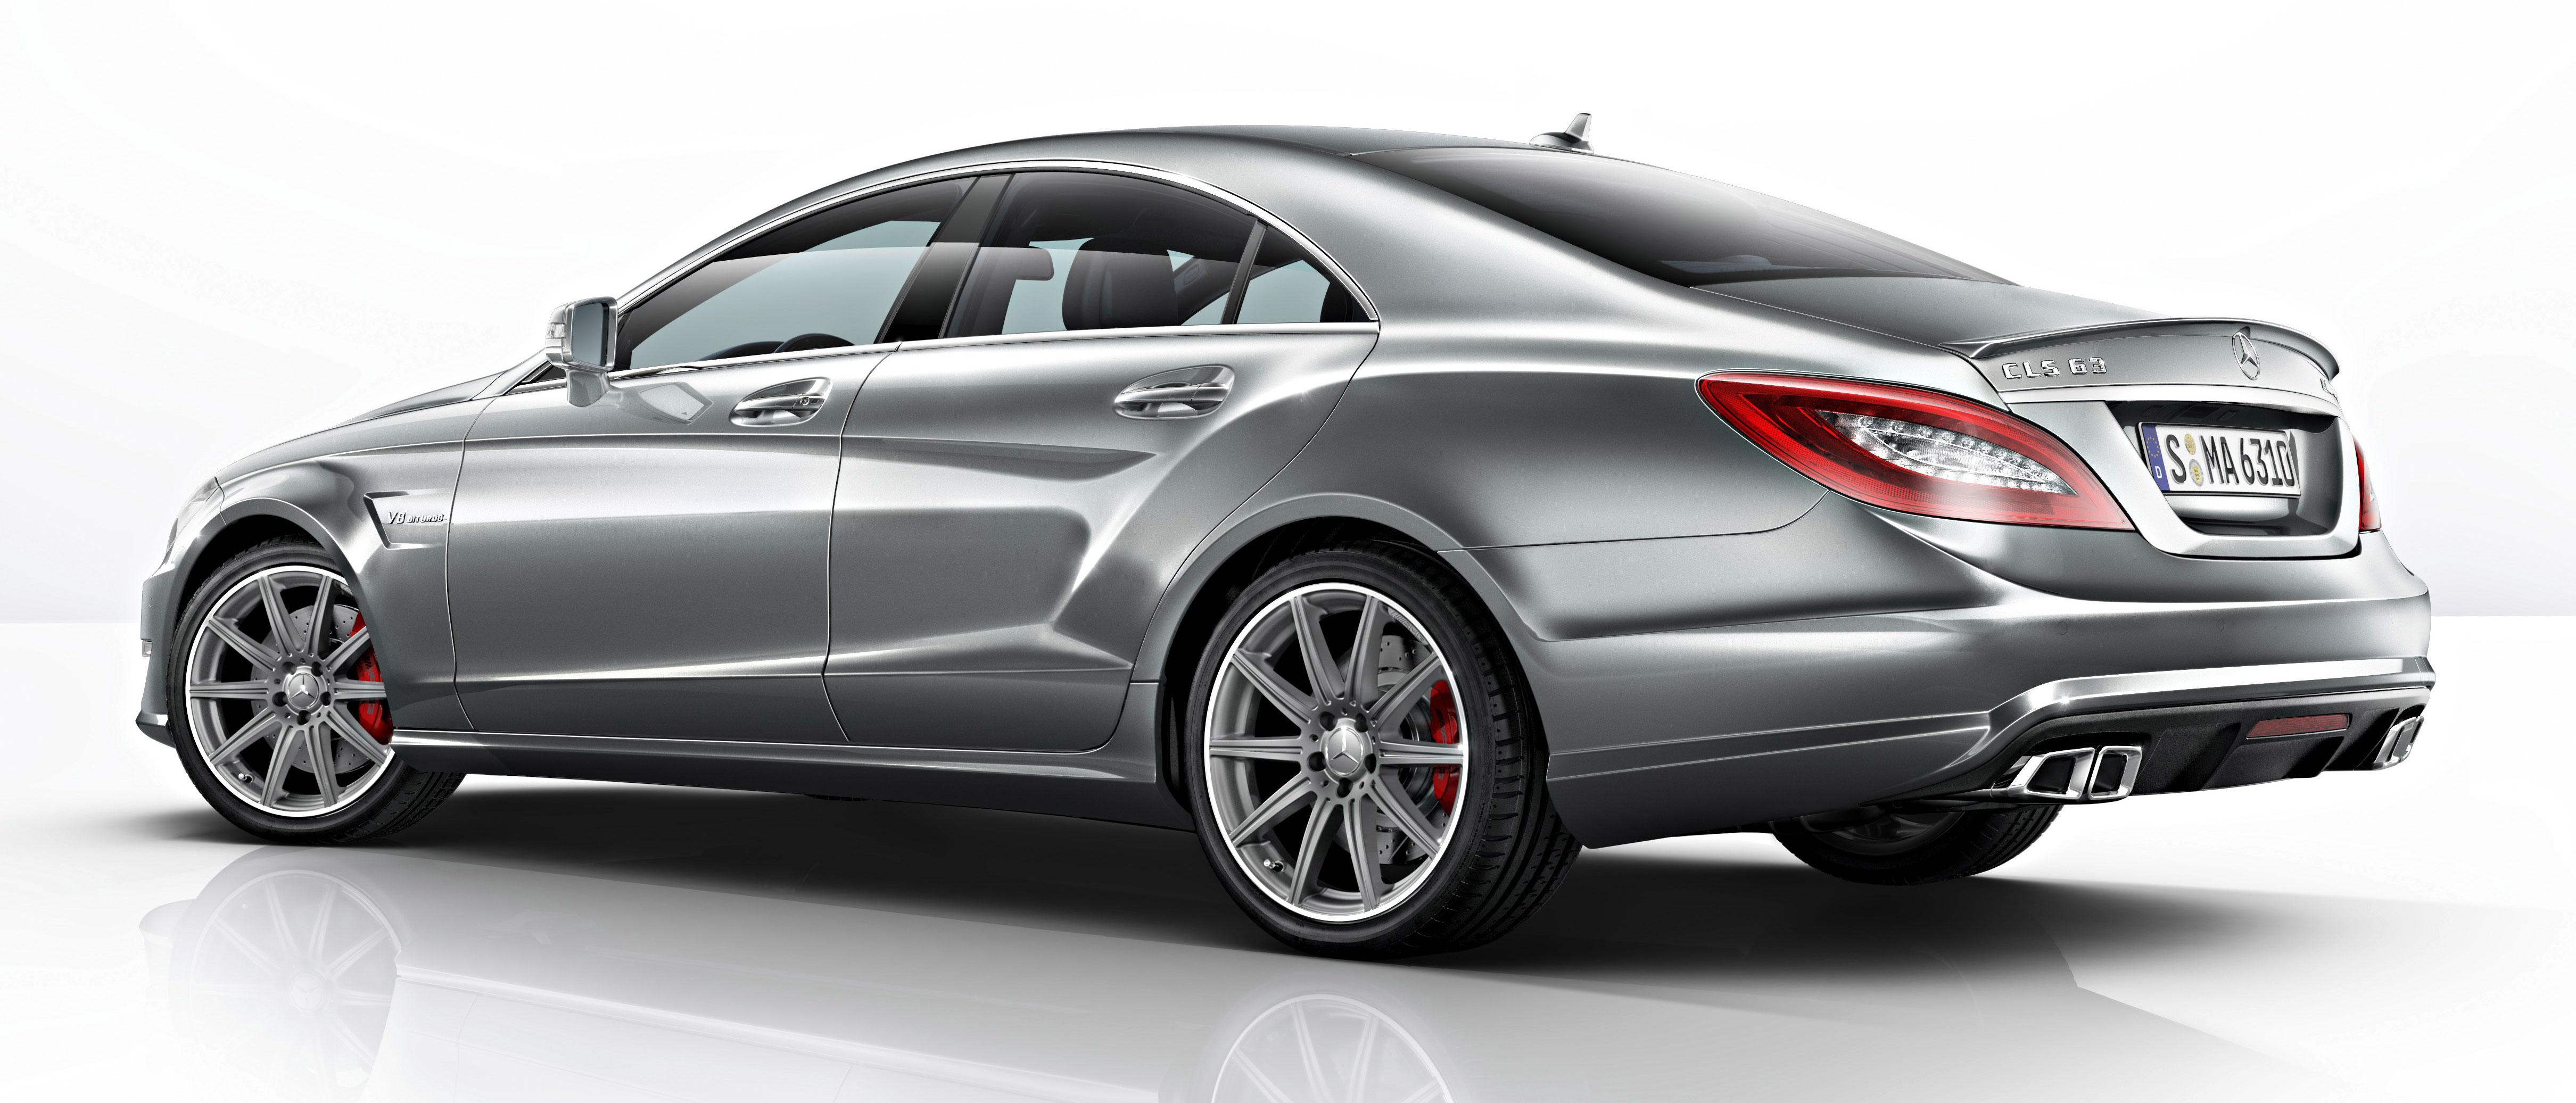 Amg Mercedes Benz >> Mercedes-Benz CLS63 AMG gets S-Model update Paul Tan - Image 149345